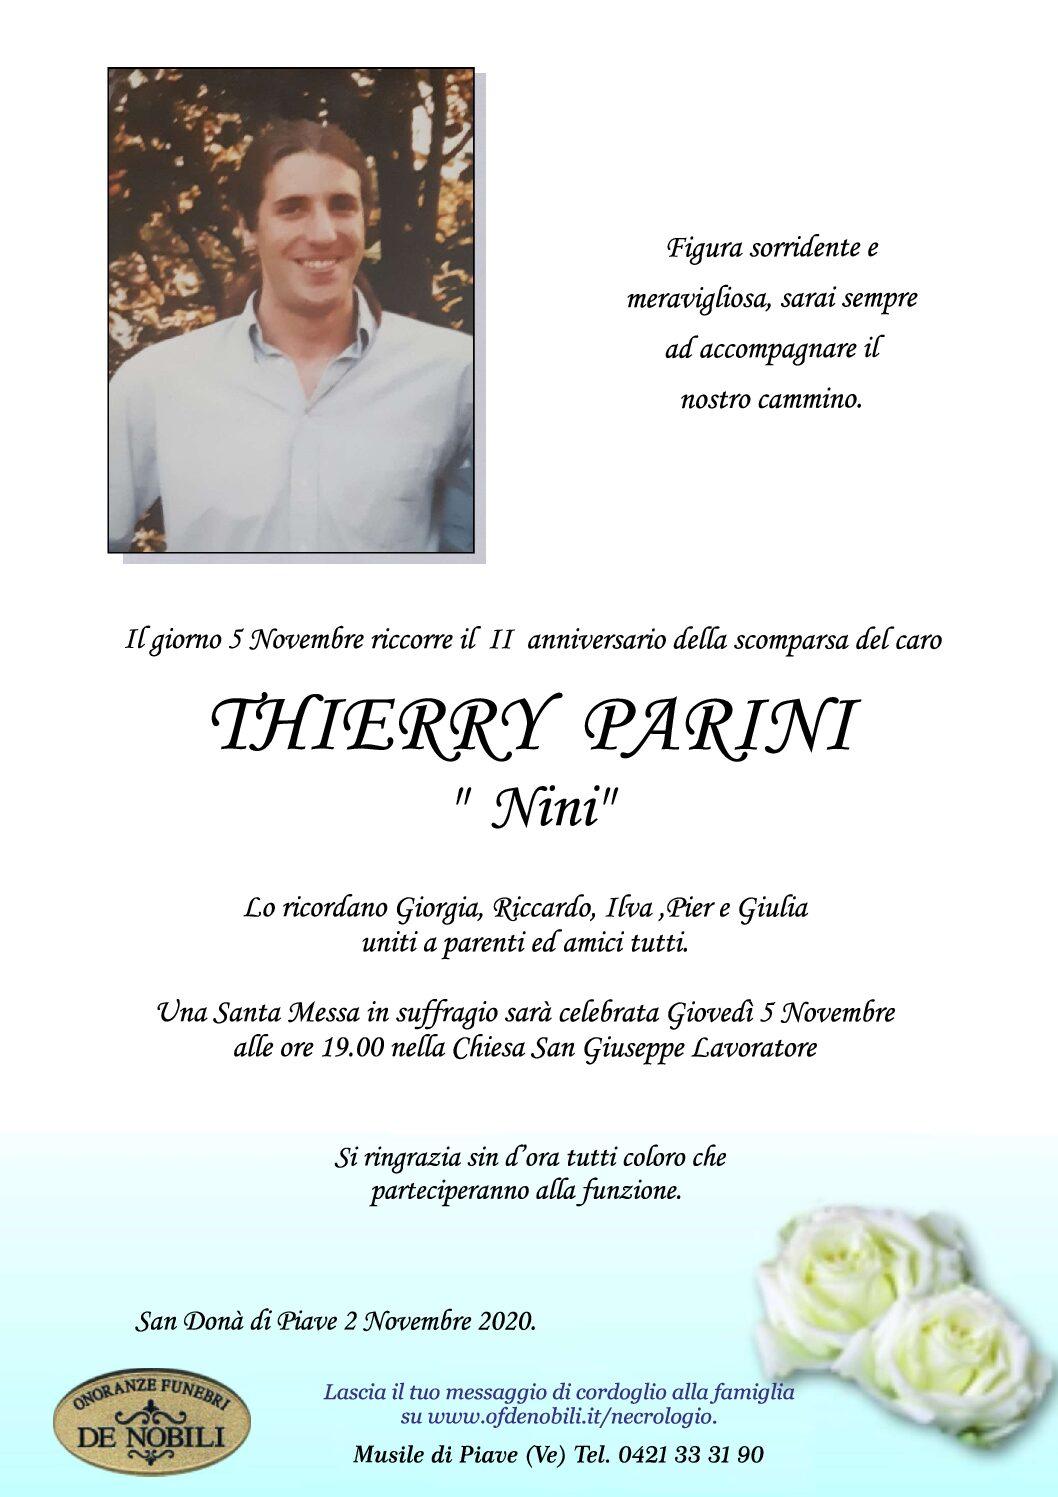 Thierry Parini